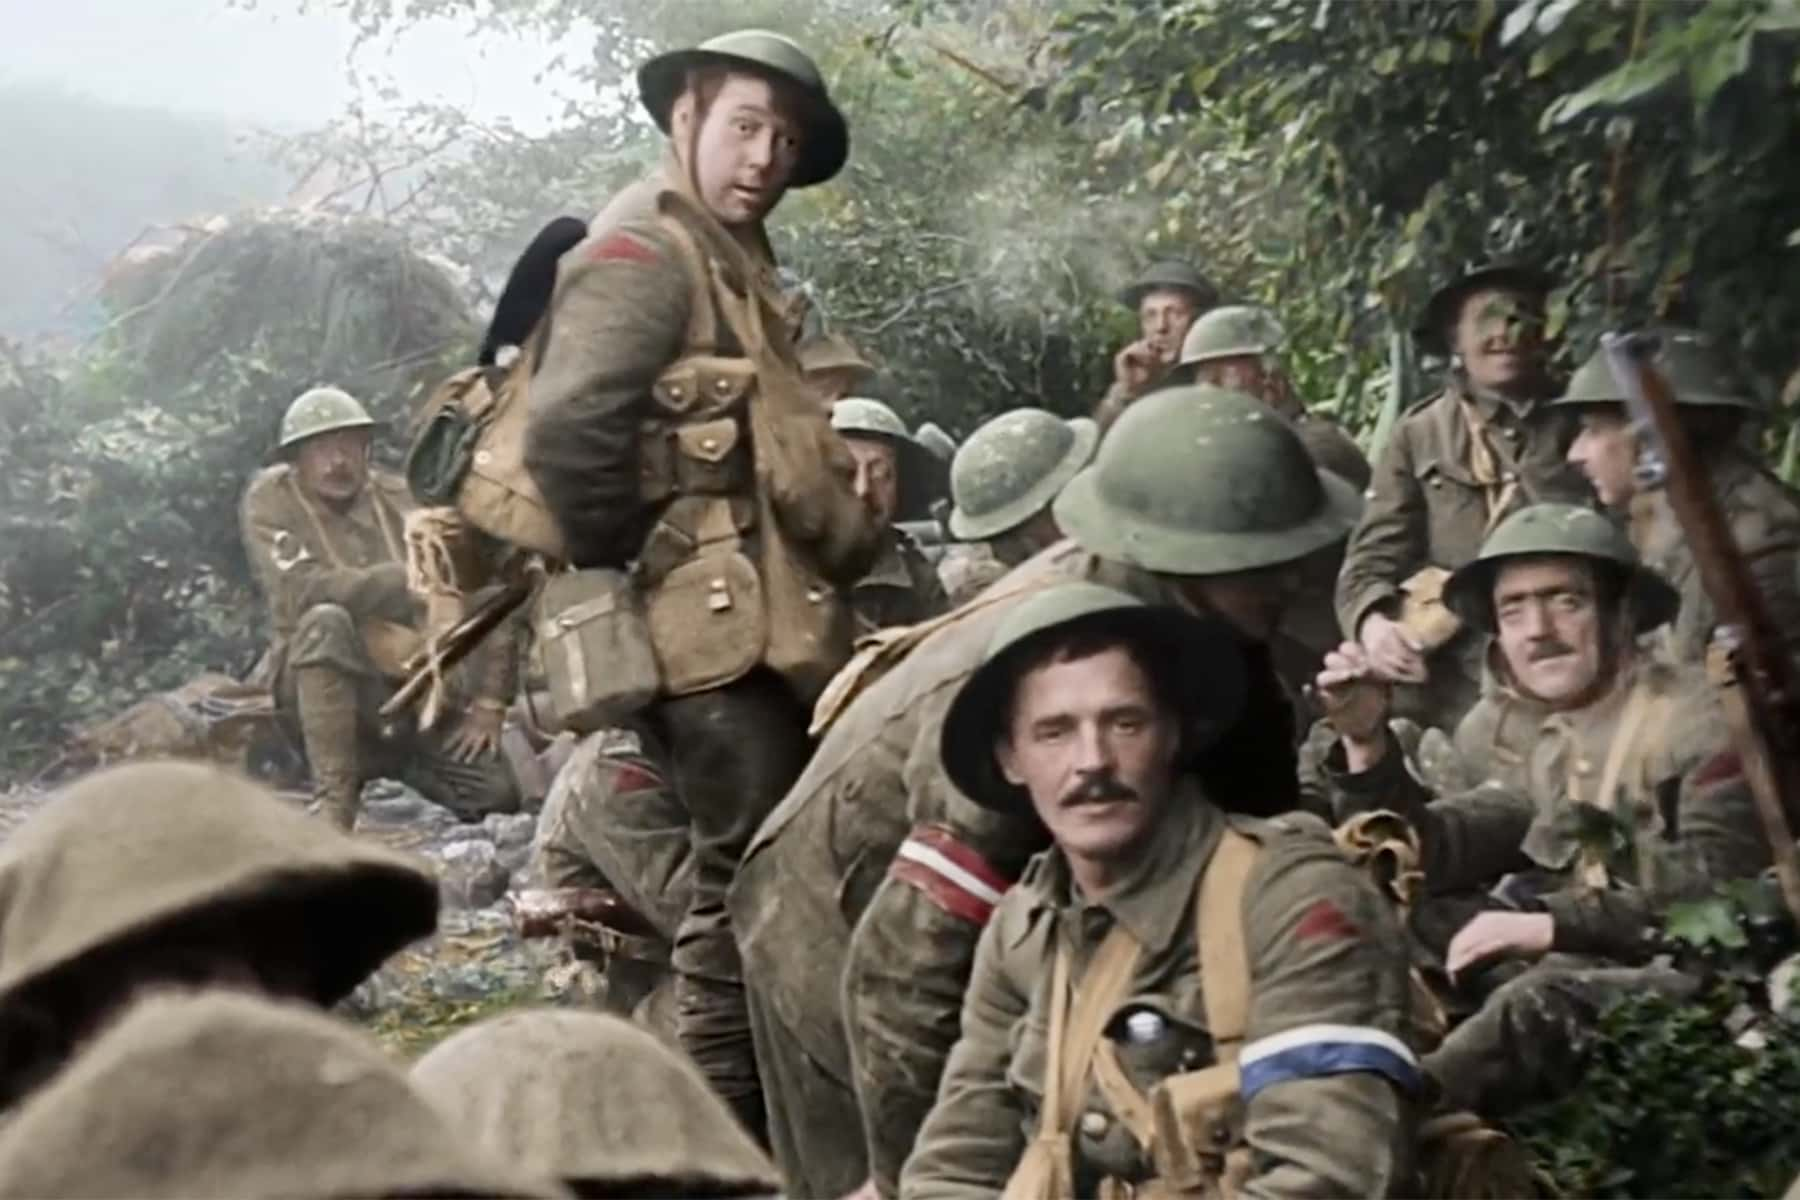 Restored Trench Warfare Footage Brings Wwi Memories Back